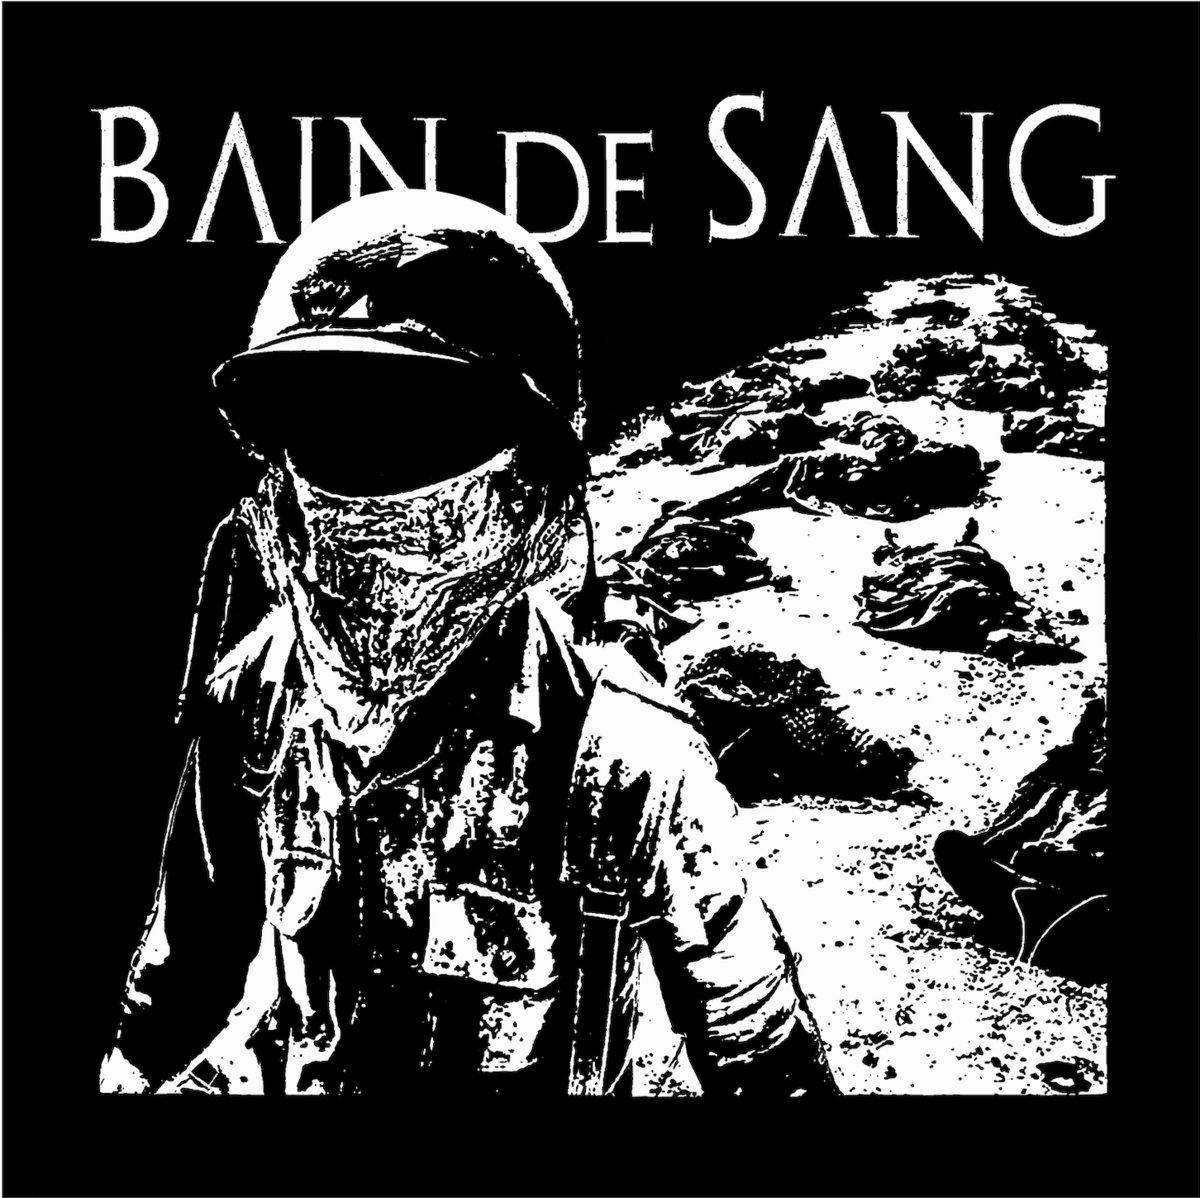 BAIN DE SANG -  Sacrificed for a load of filth and lies